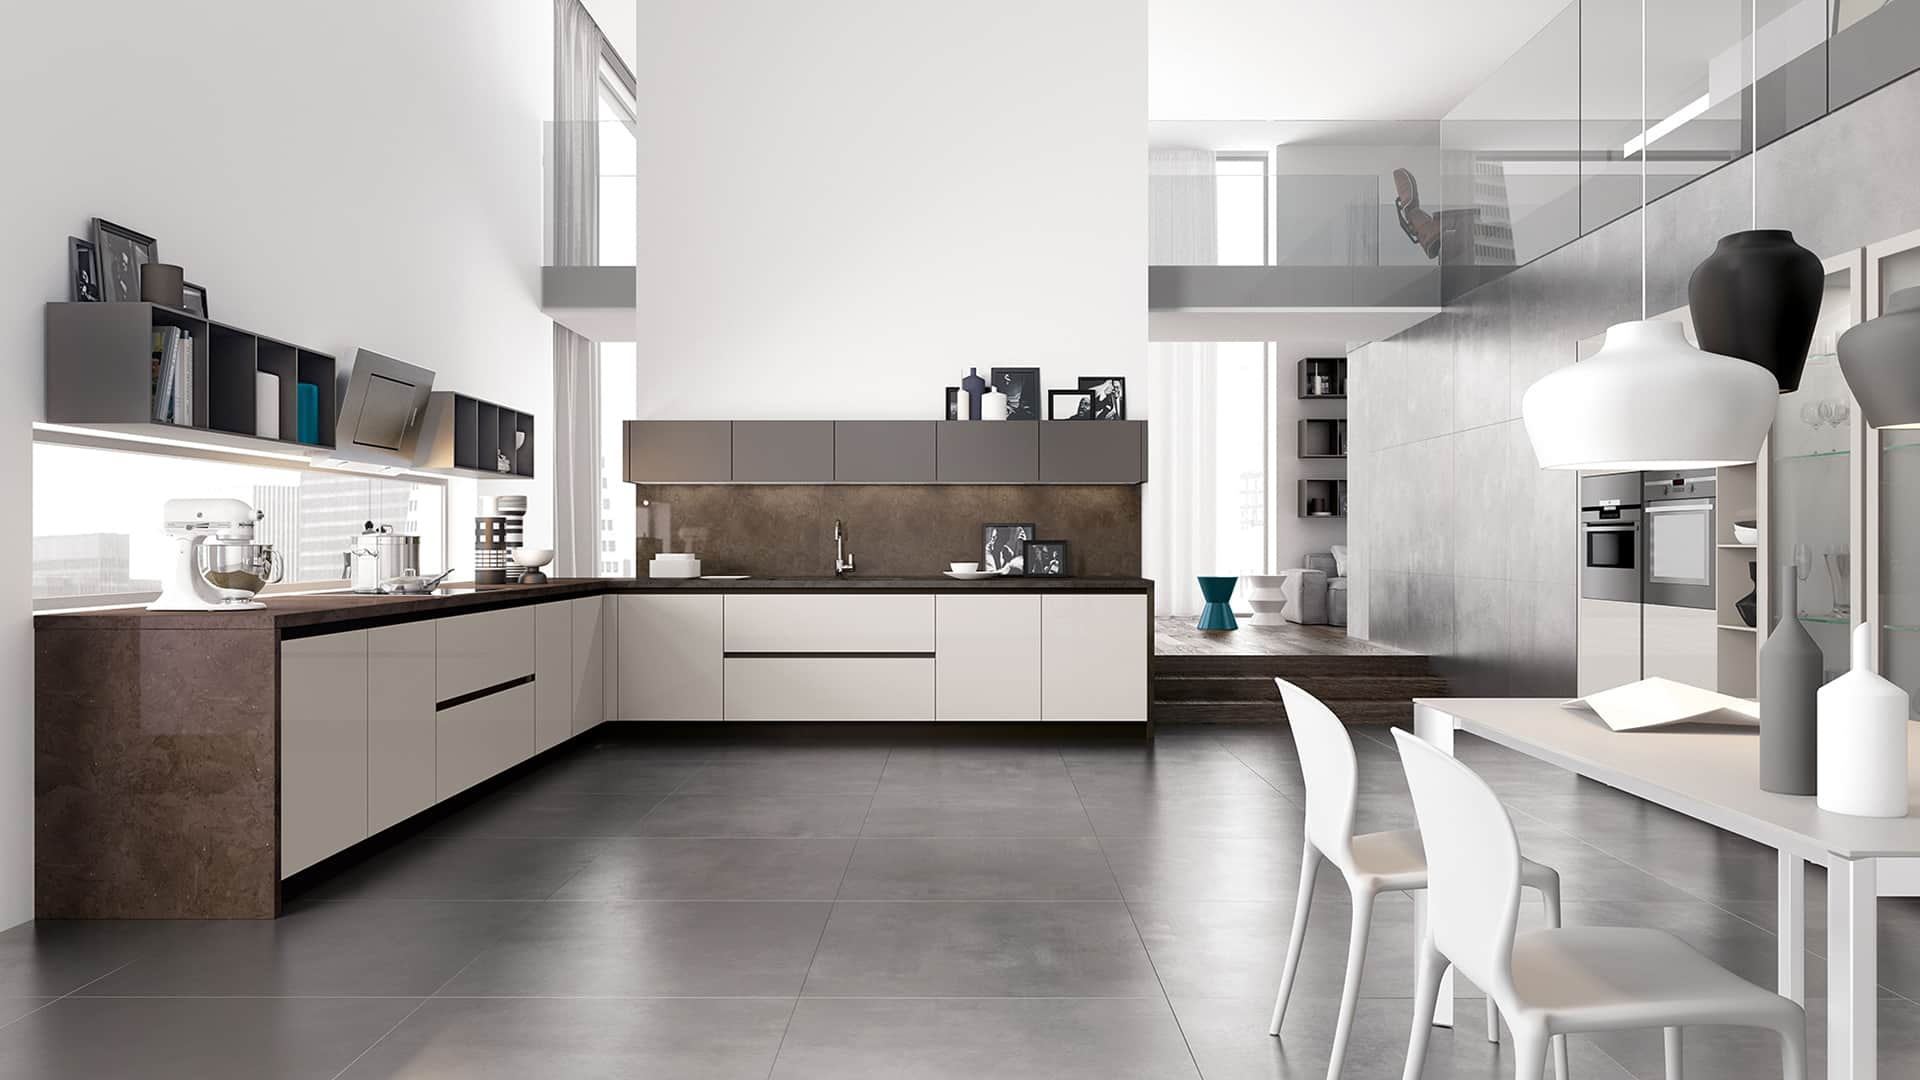 Cucine angolari moderne a padova - Arredamento per cucina ...